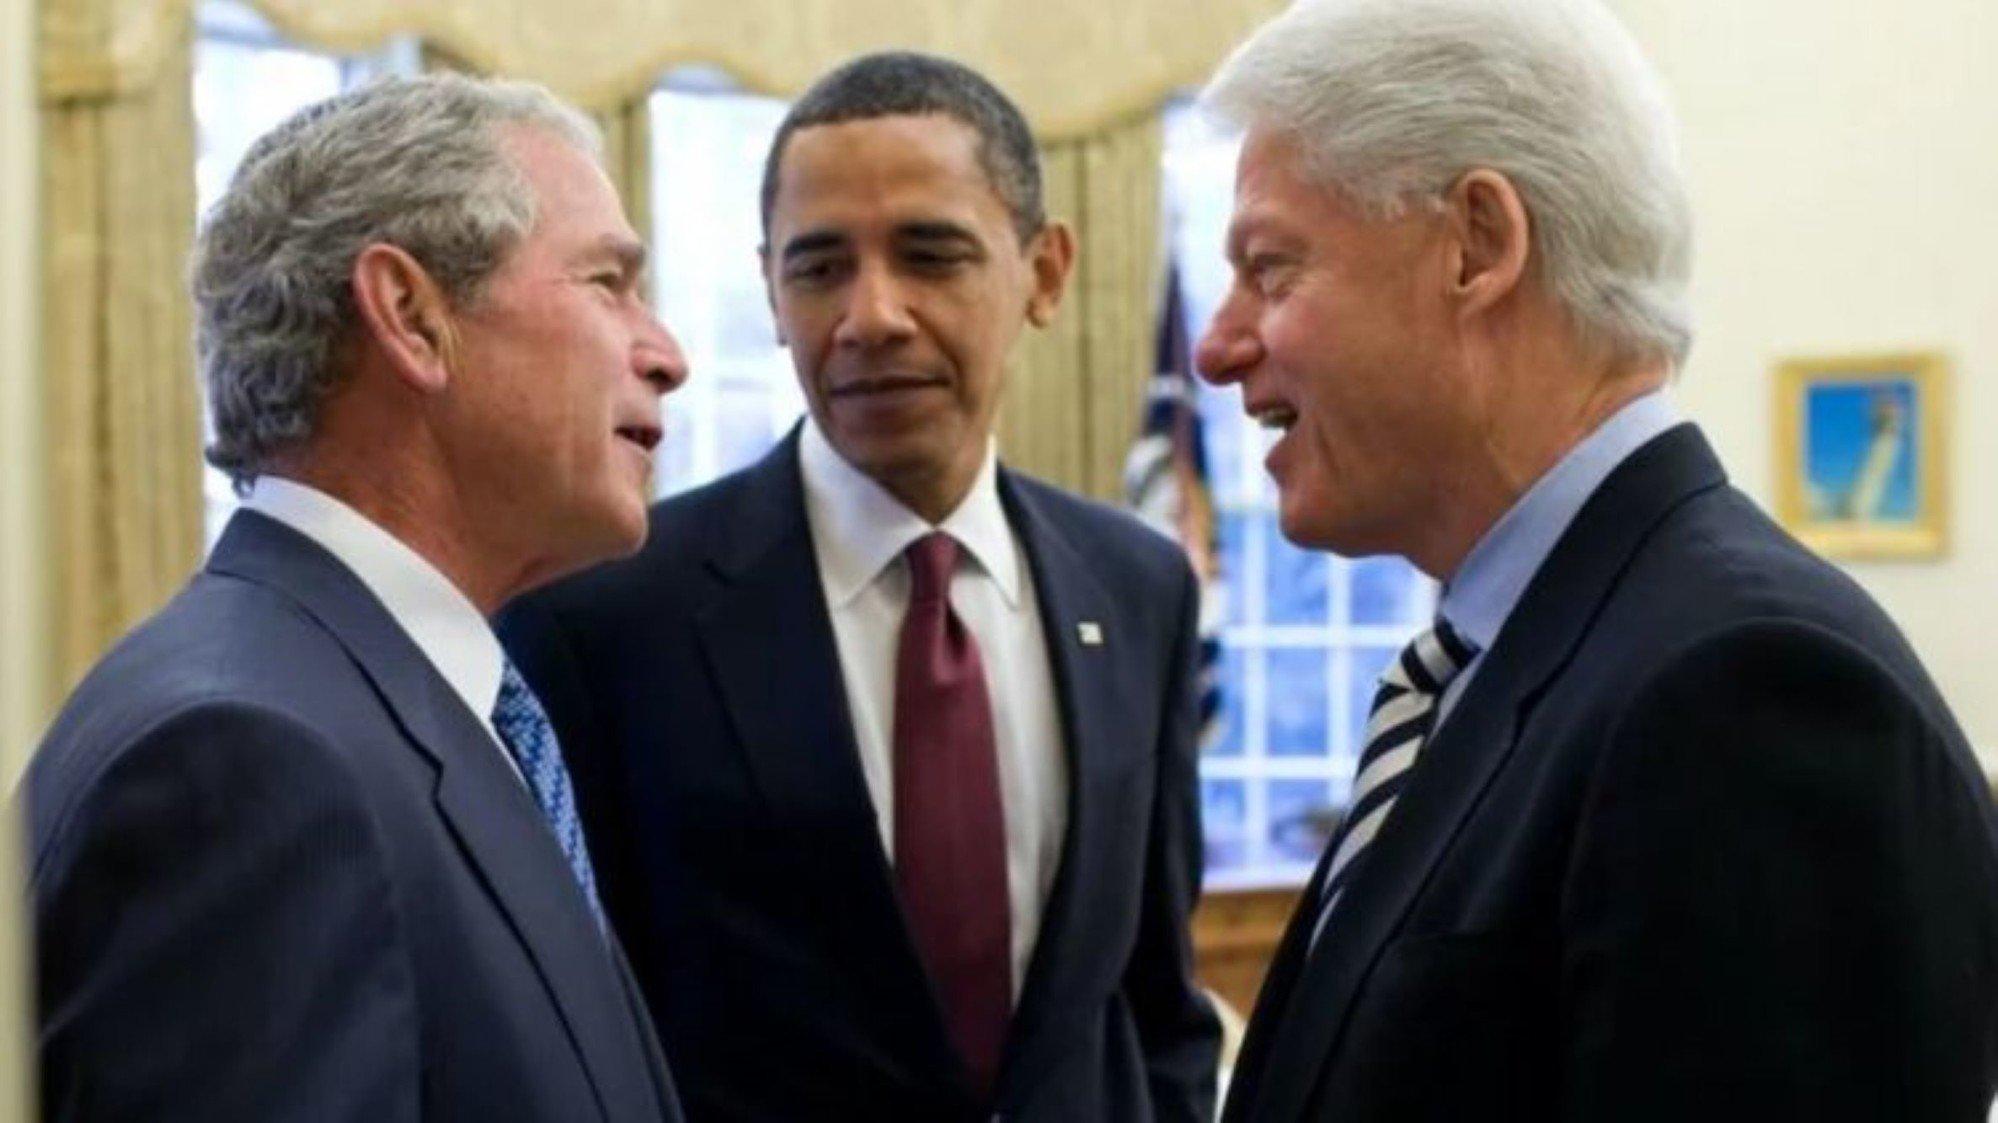 Четыре президента США осудили штурм Капитолия